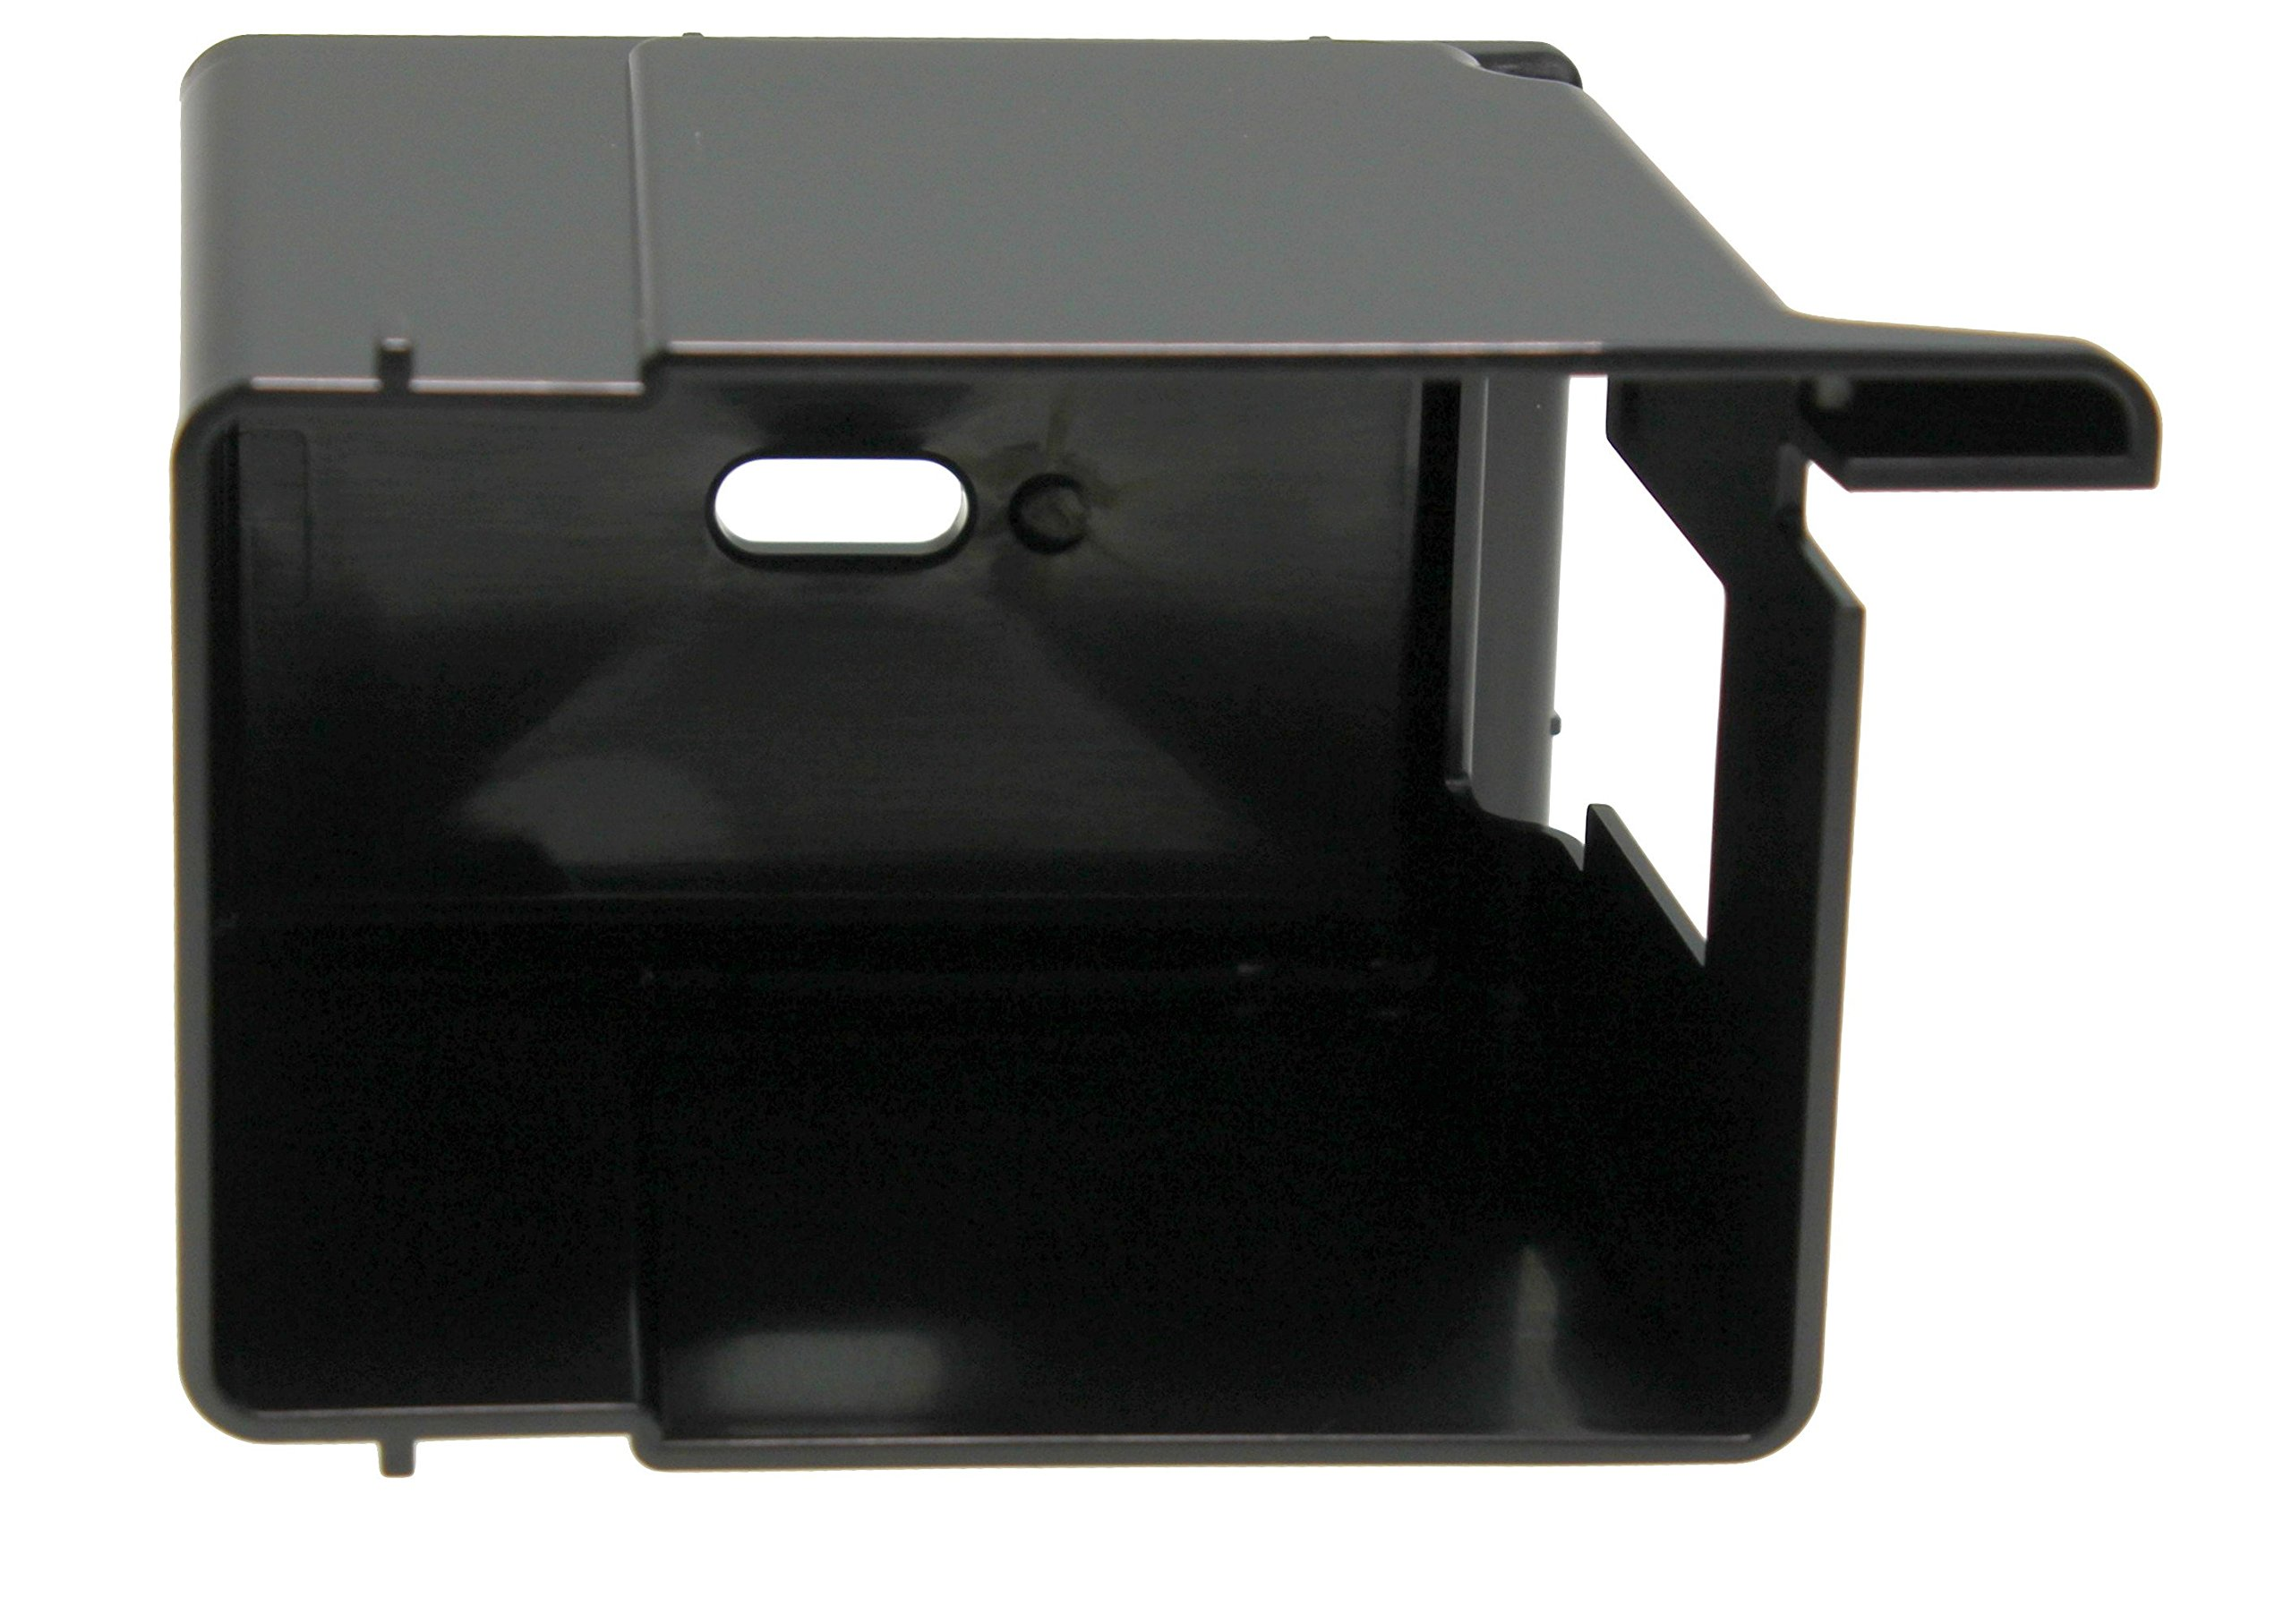 Krups MS de 624393 Cápsula Depósito para xn6018, xn6008 Expert & Milk Nespresso Automat: Amazon.es: Hogar